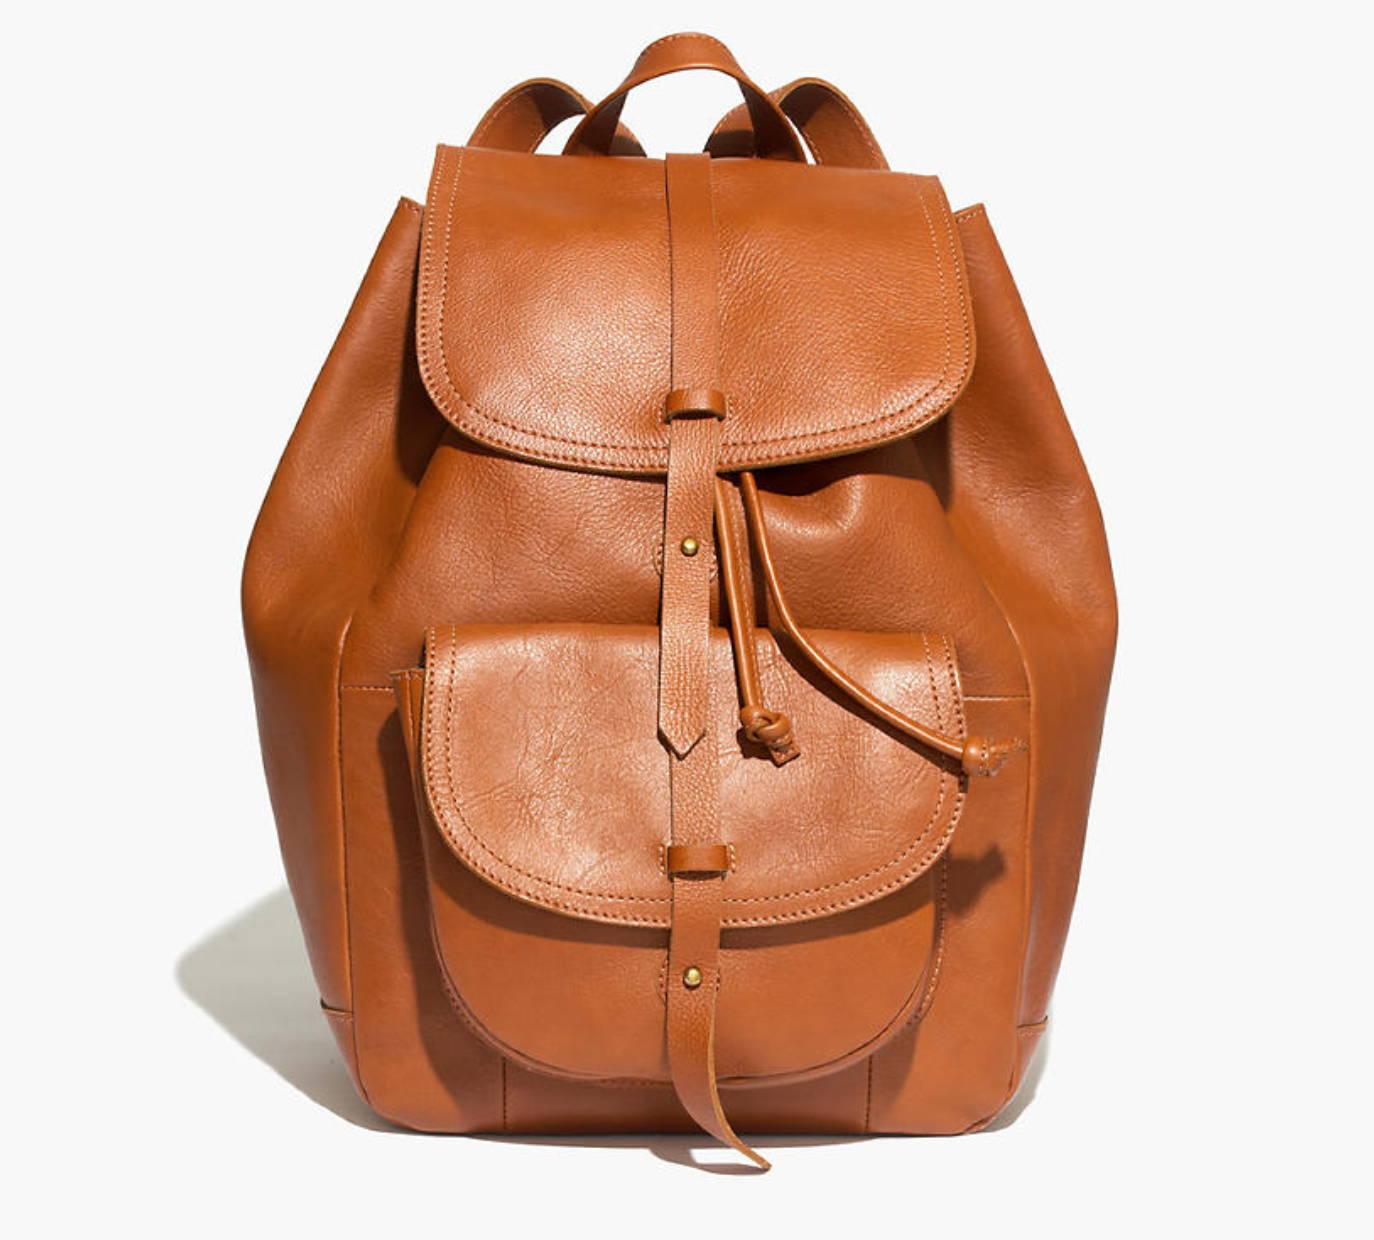 Madewell Transport rucksack